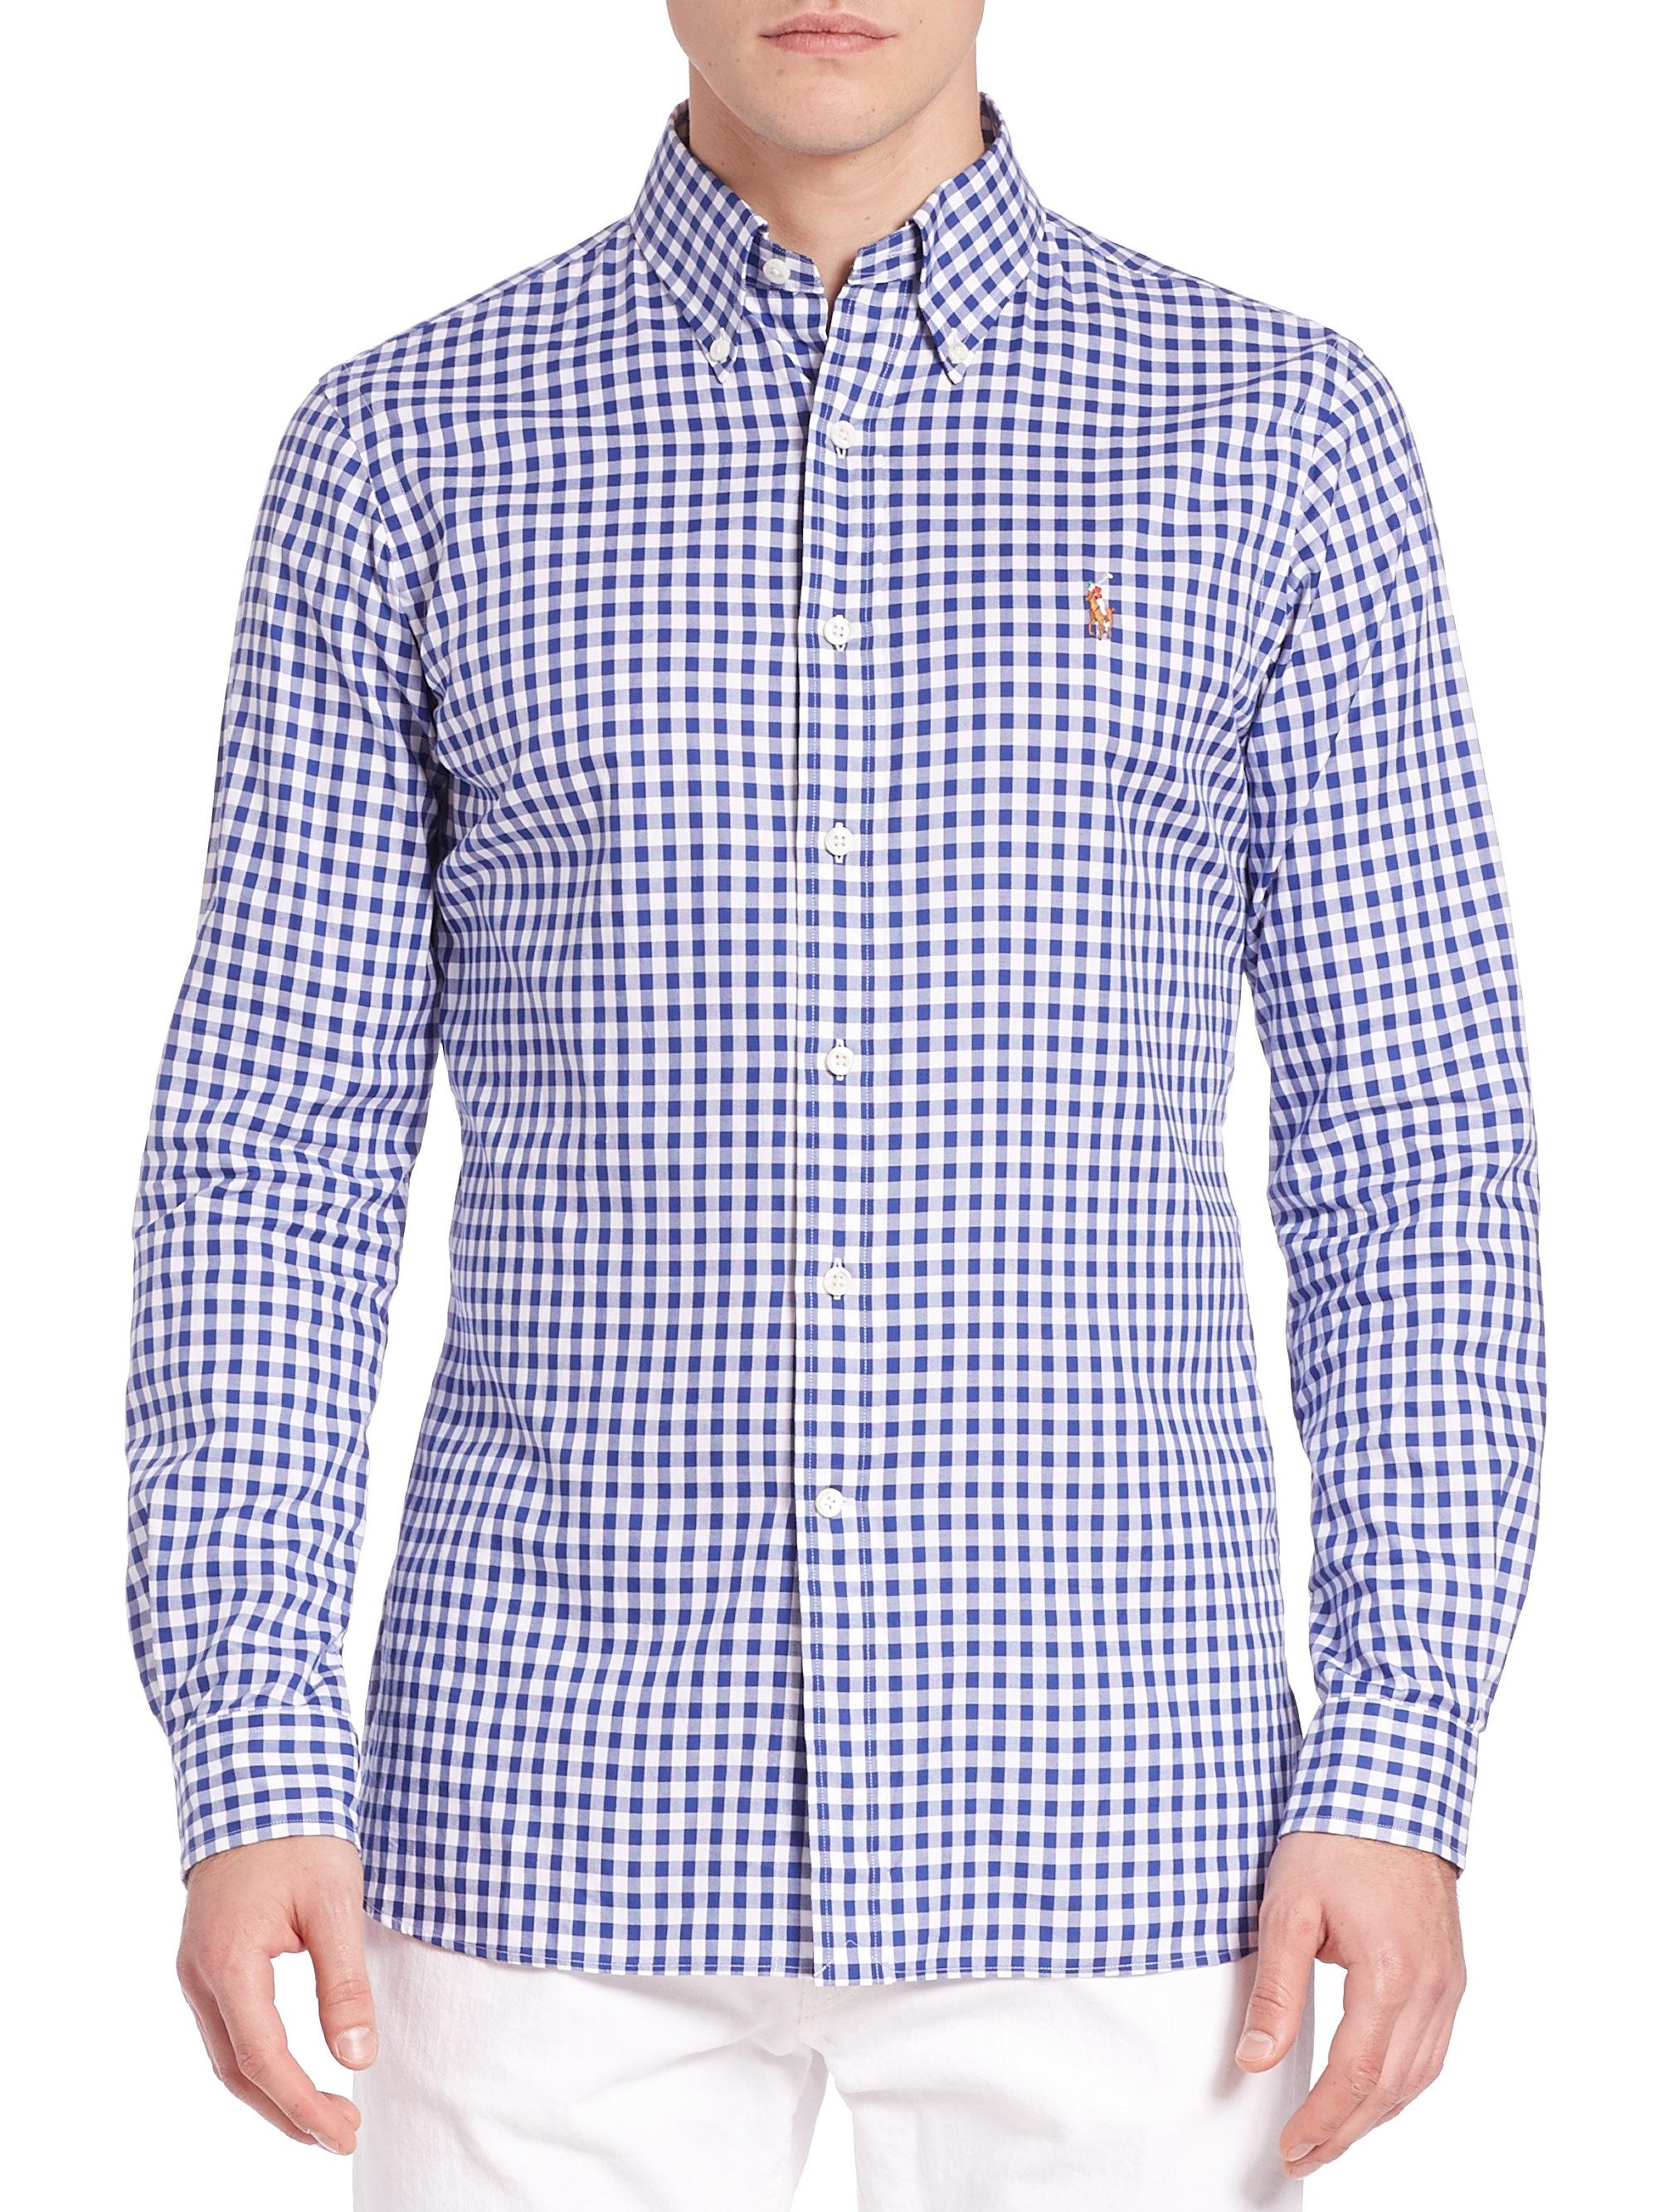 Polo Button Down Shirts: Shop Polo Button Down Shirts - Macy's